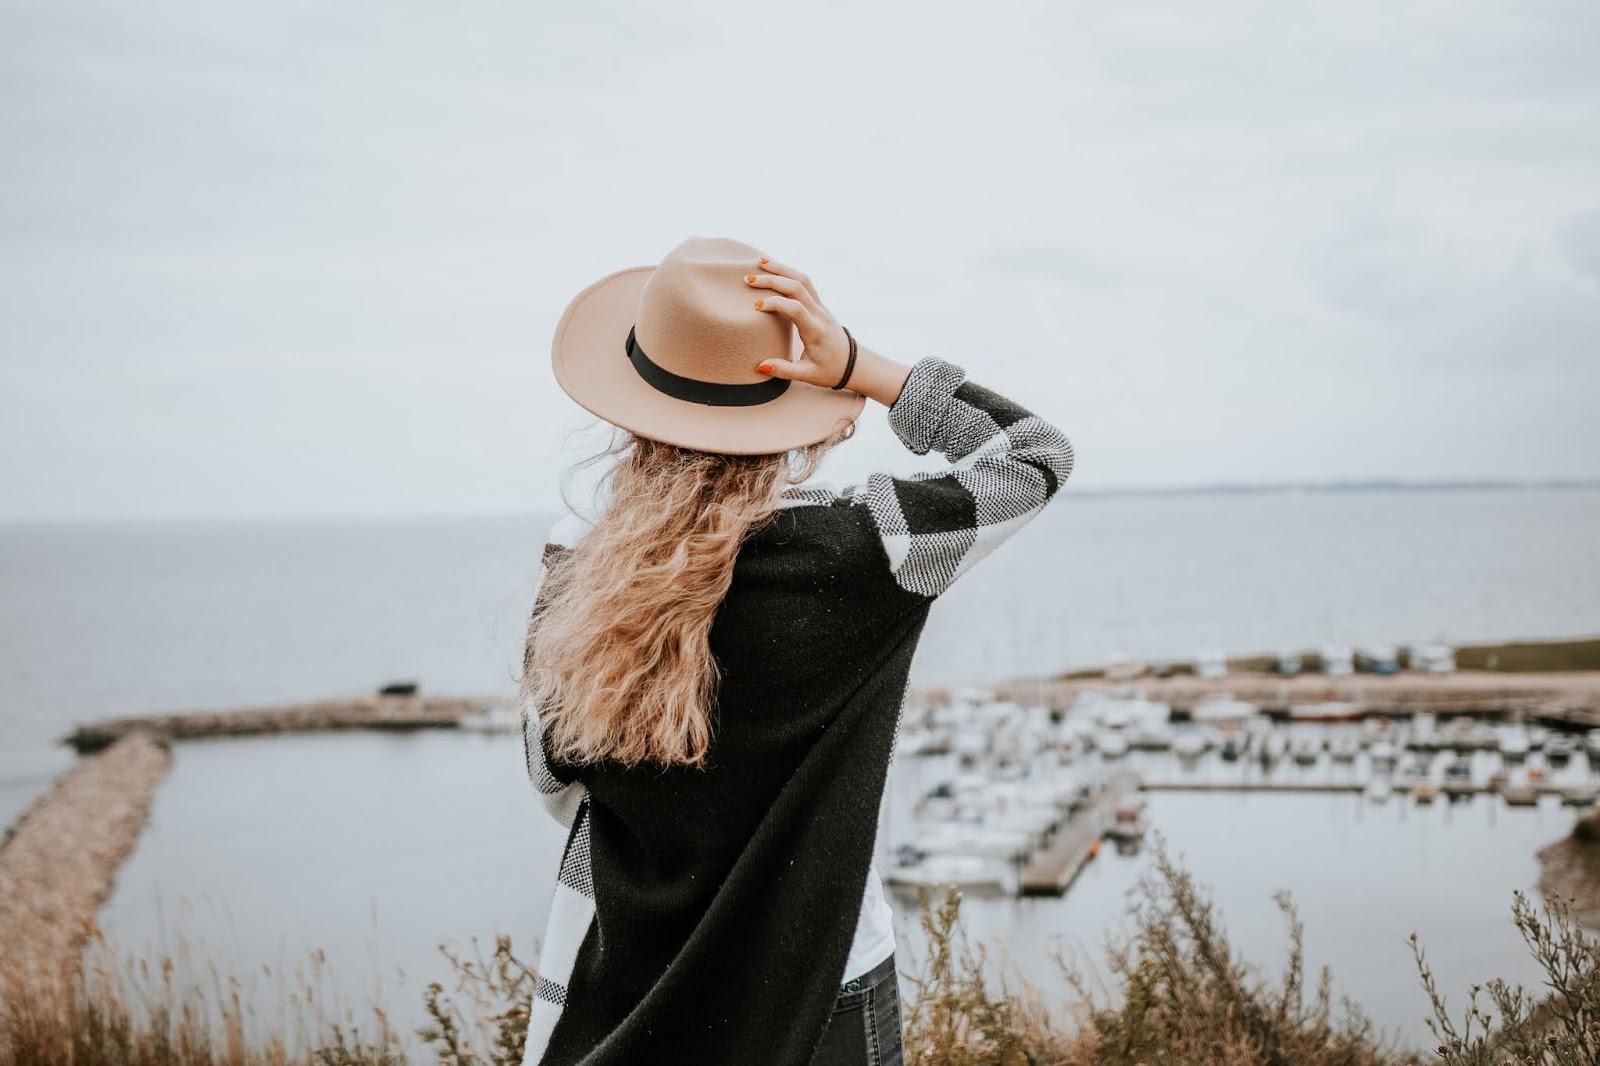 Widok na port Ejerslev, wyspa Mors